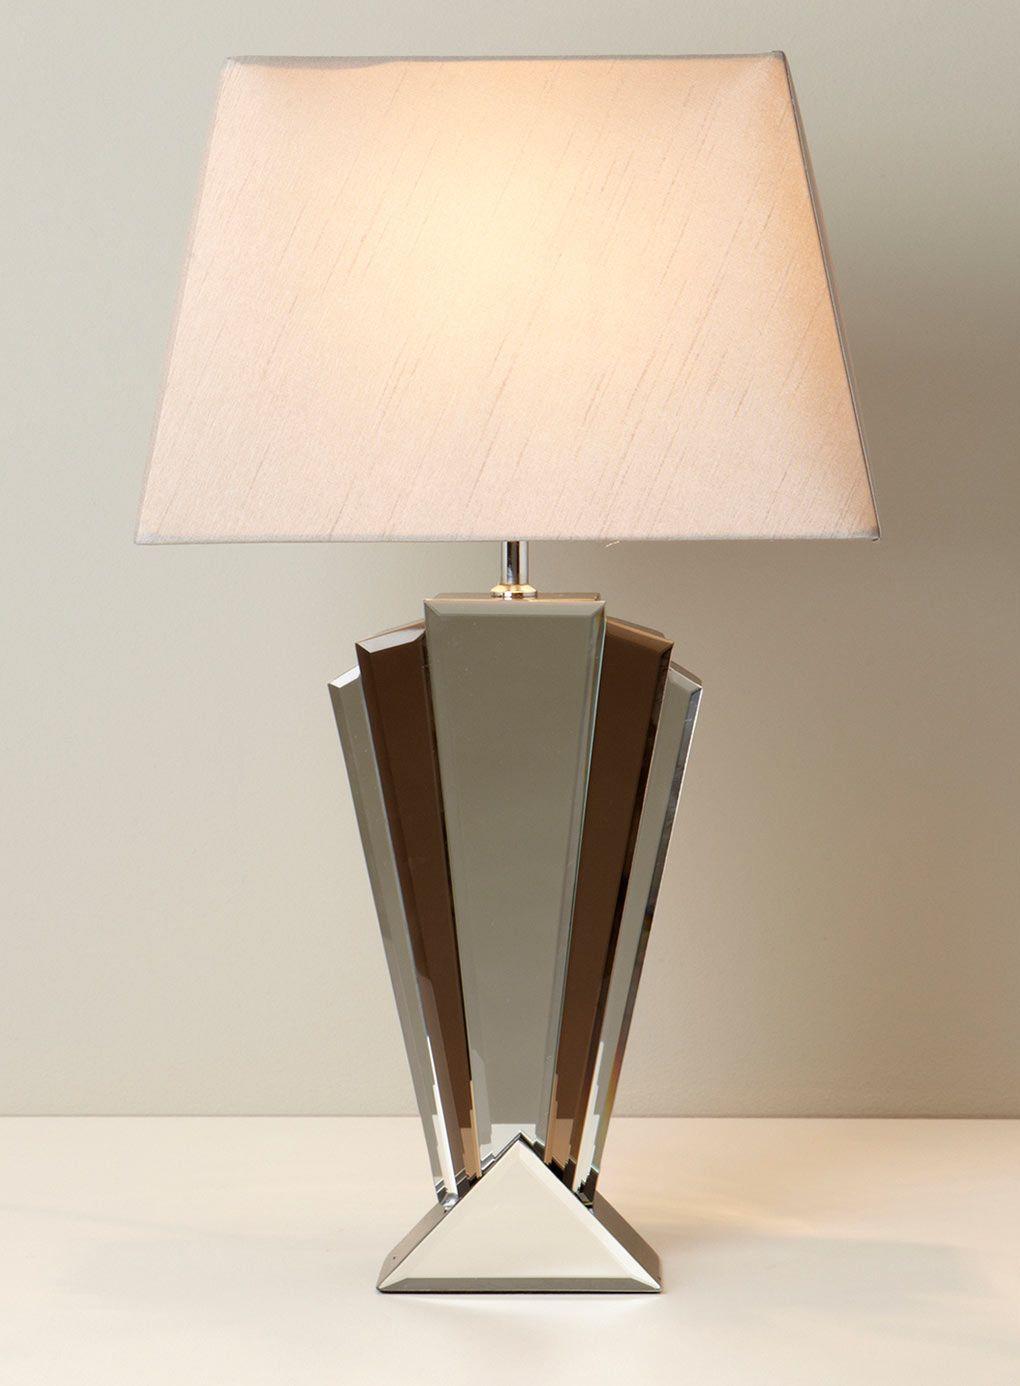 Mirror Deco Table Lamp   Table Lamps   Home, Lighting U0026 Furniture